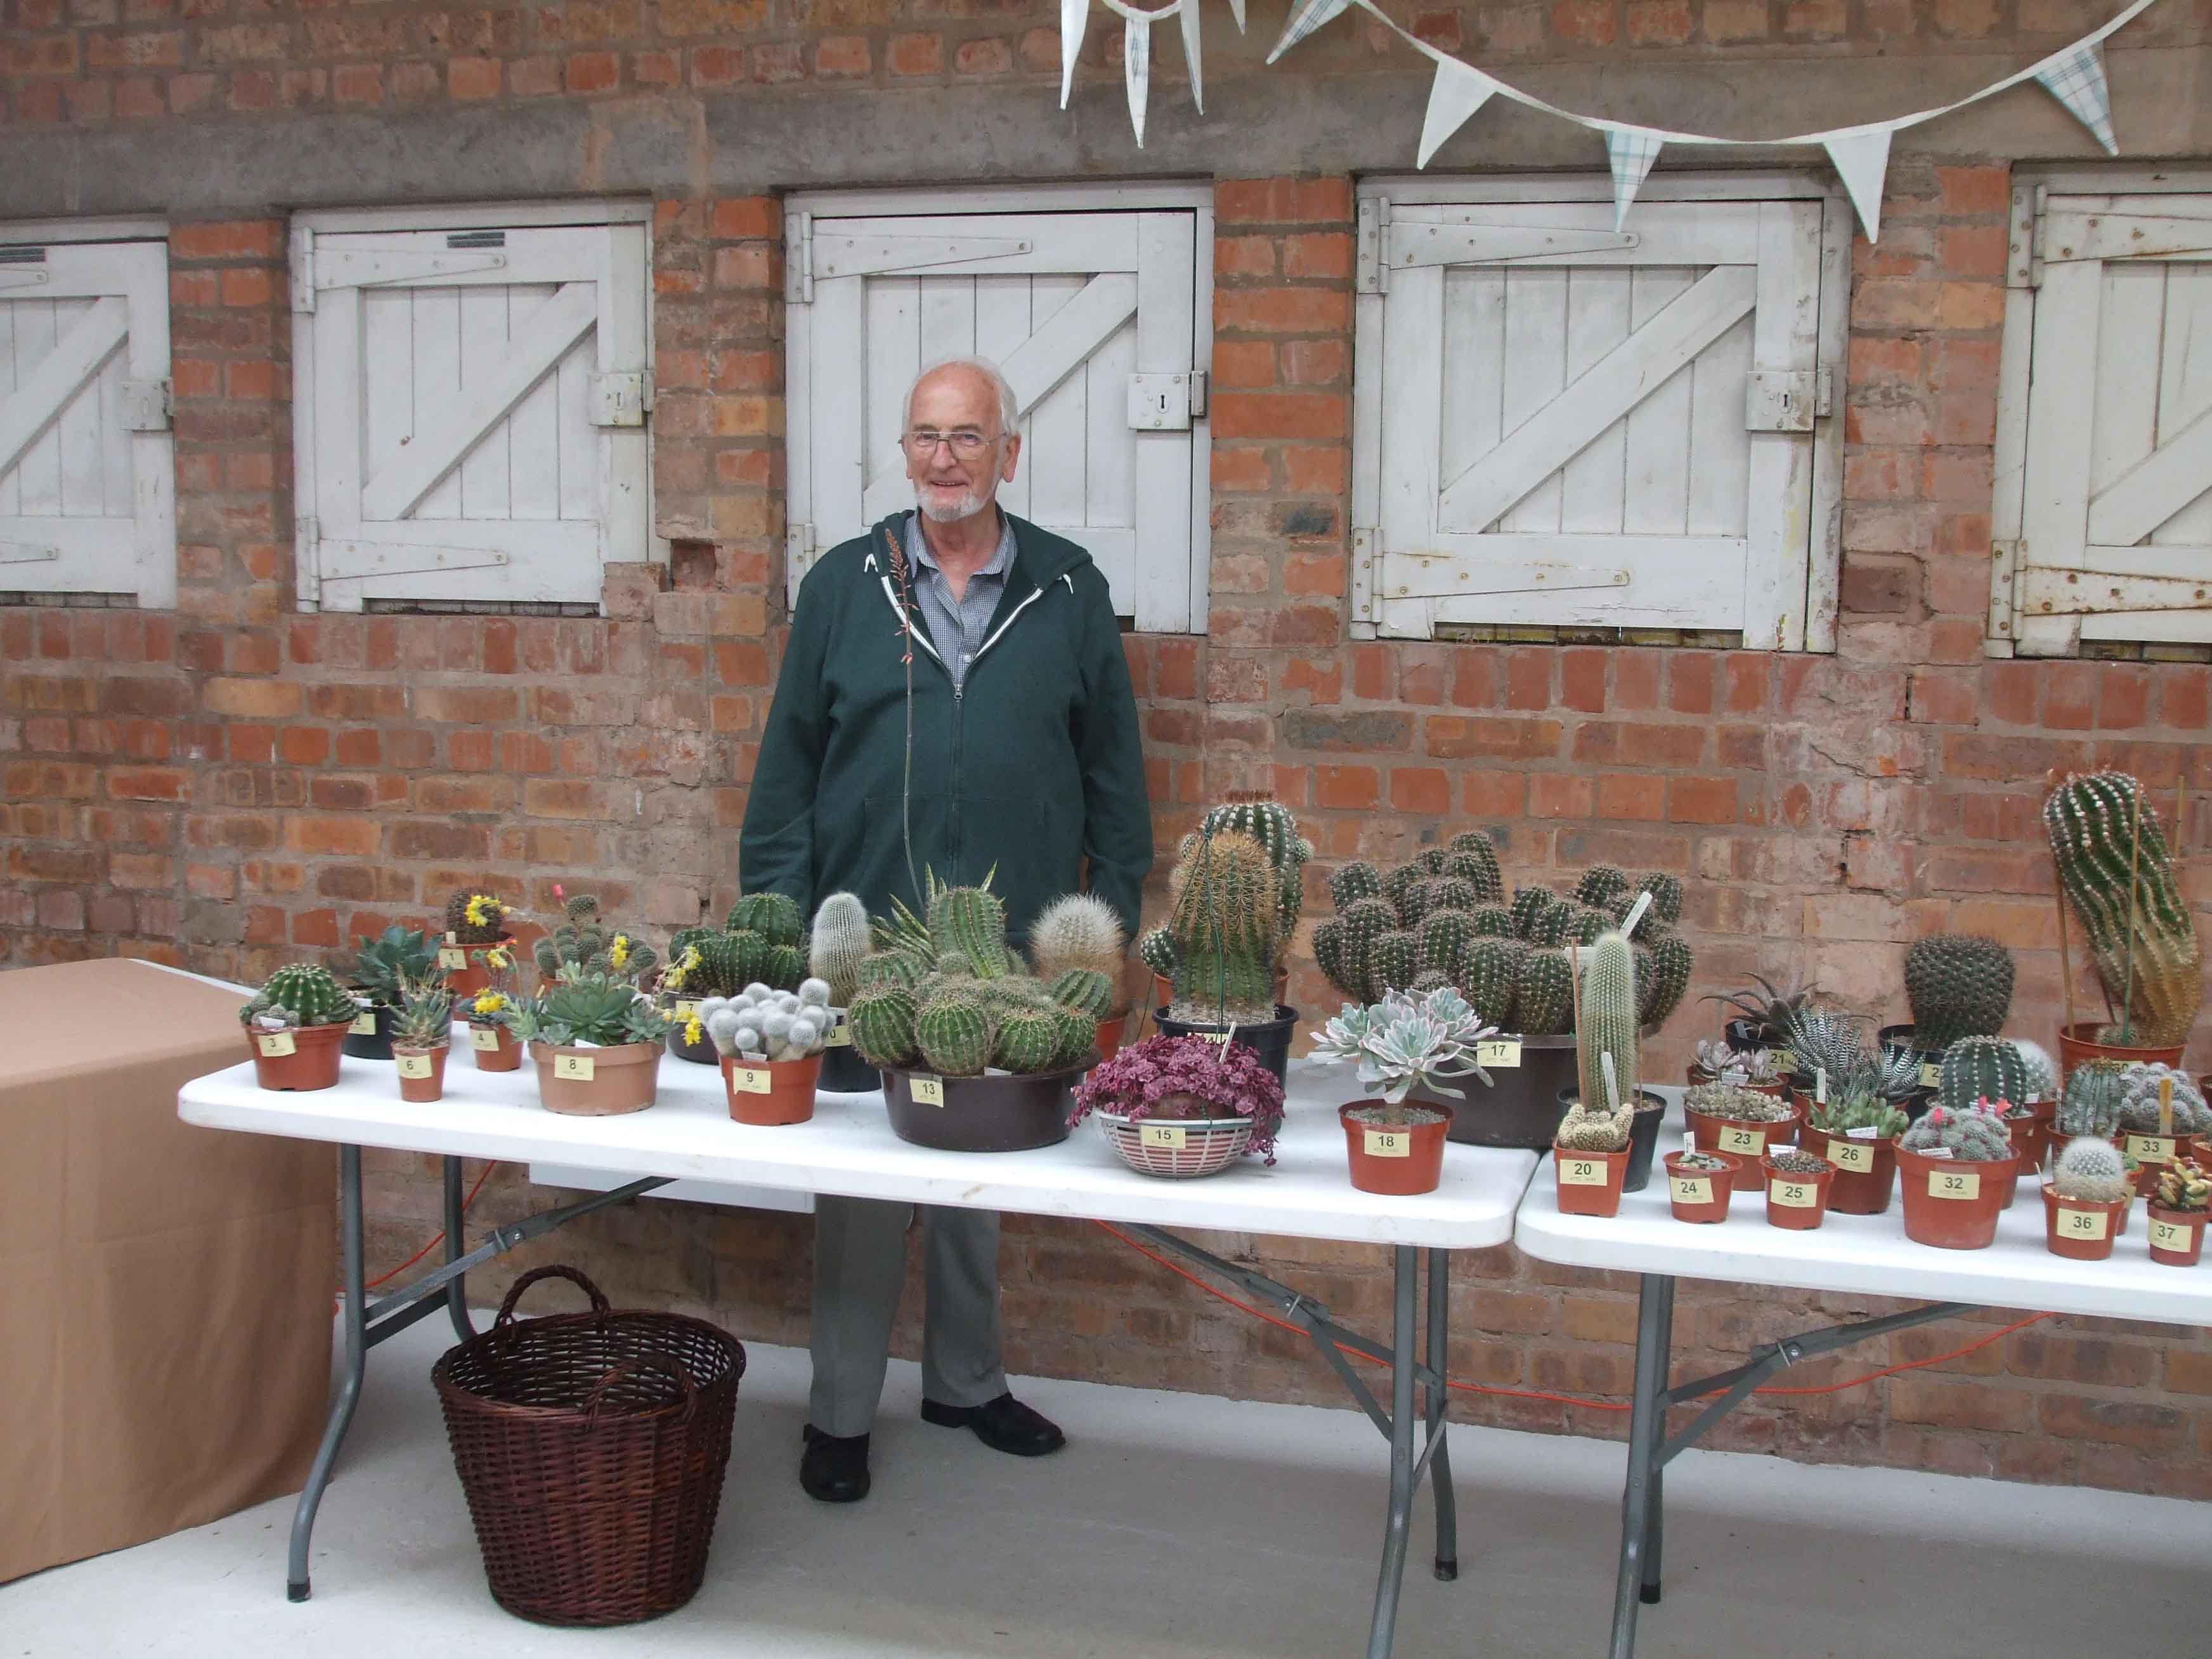 Derek and his plants